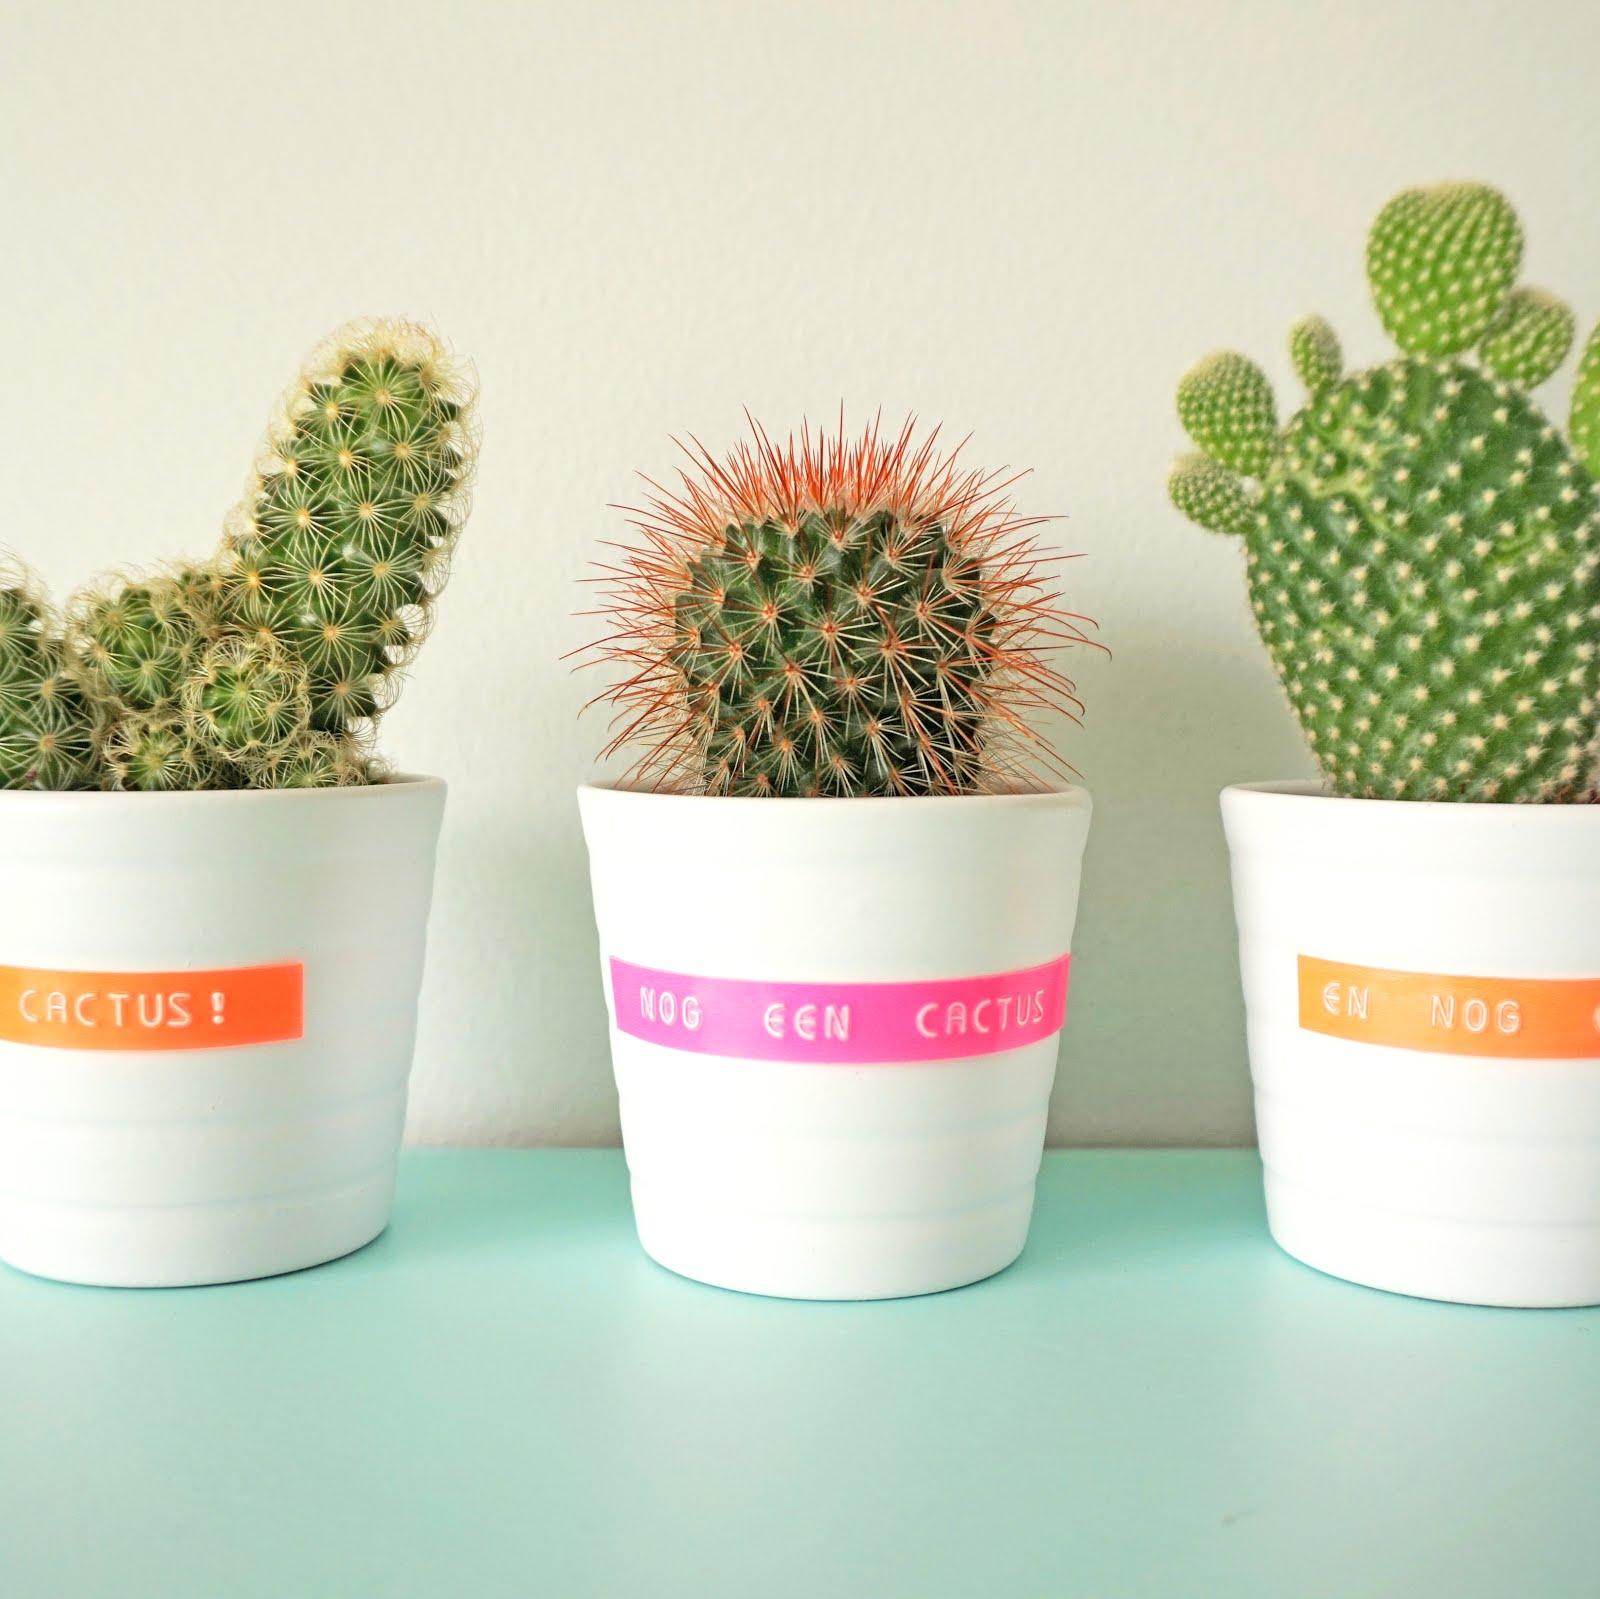 Gelabelde cactuspotjes